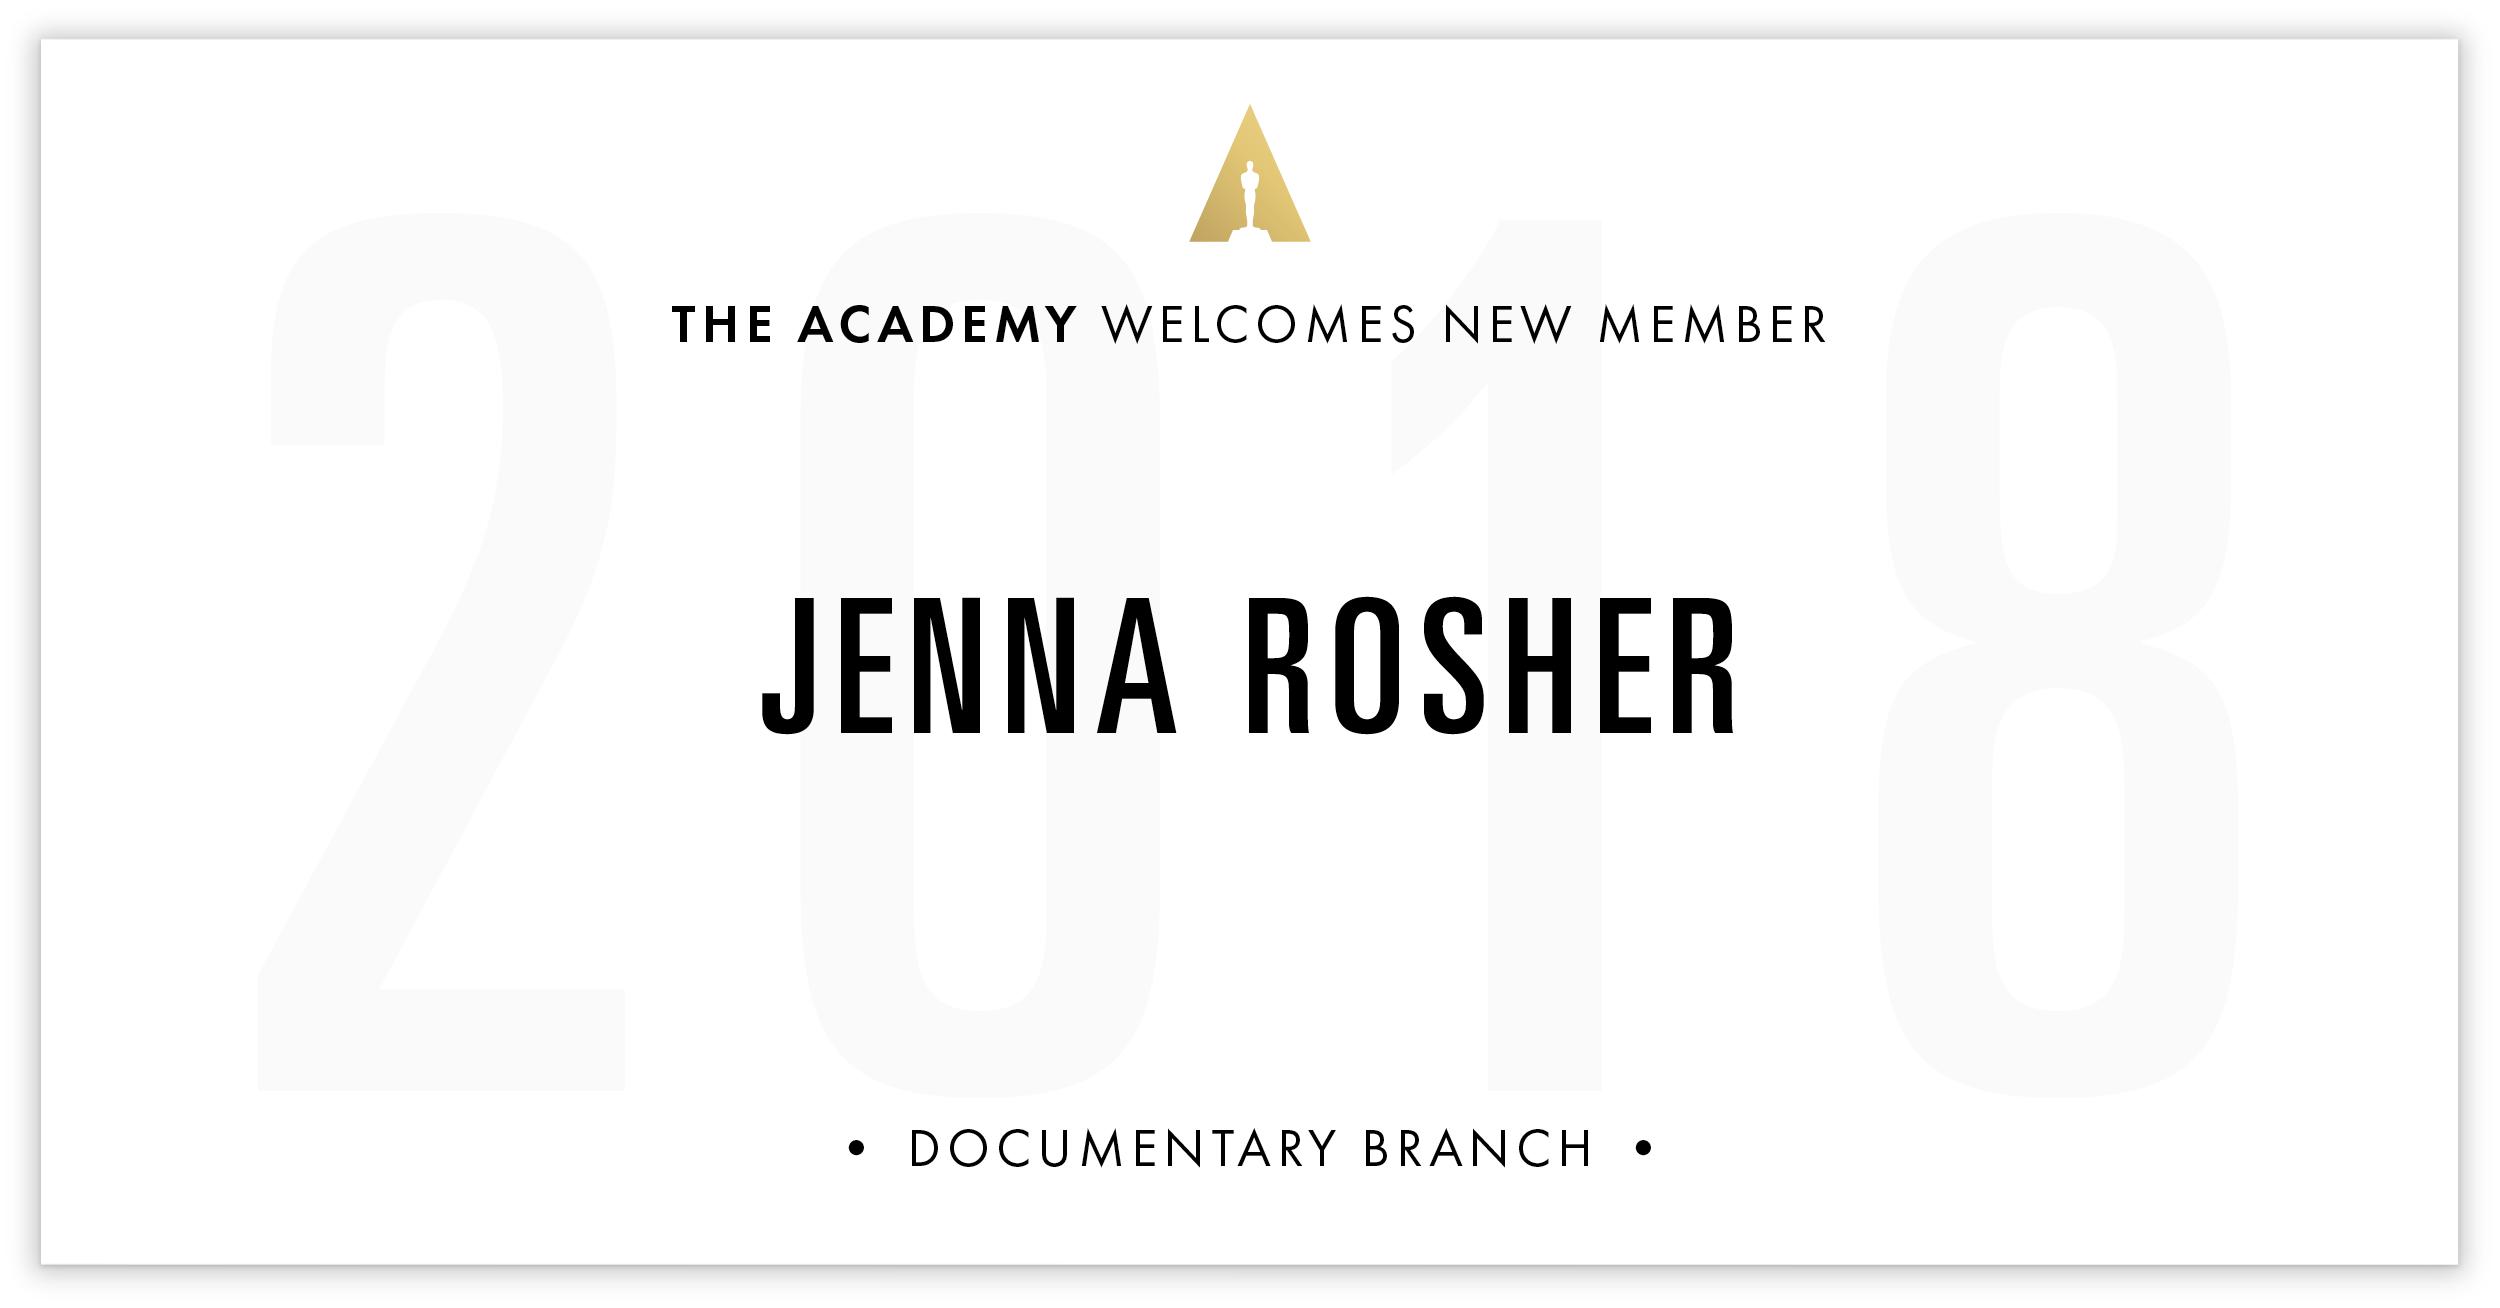 Jenna Rosher is invited!